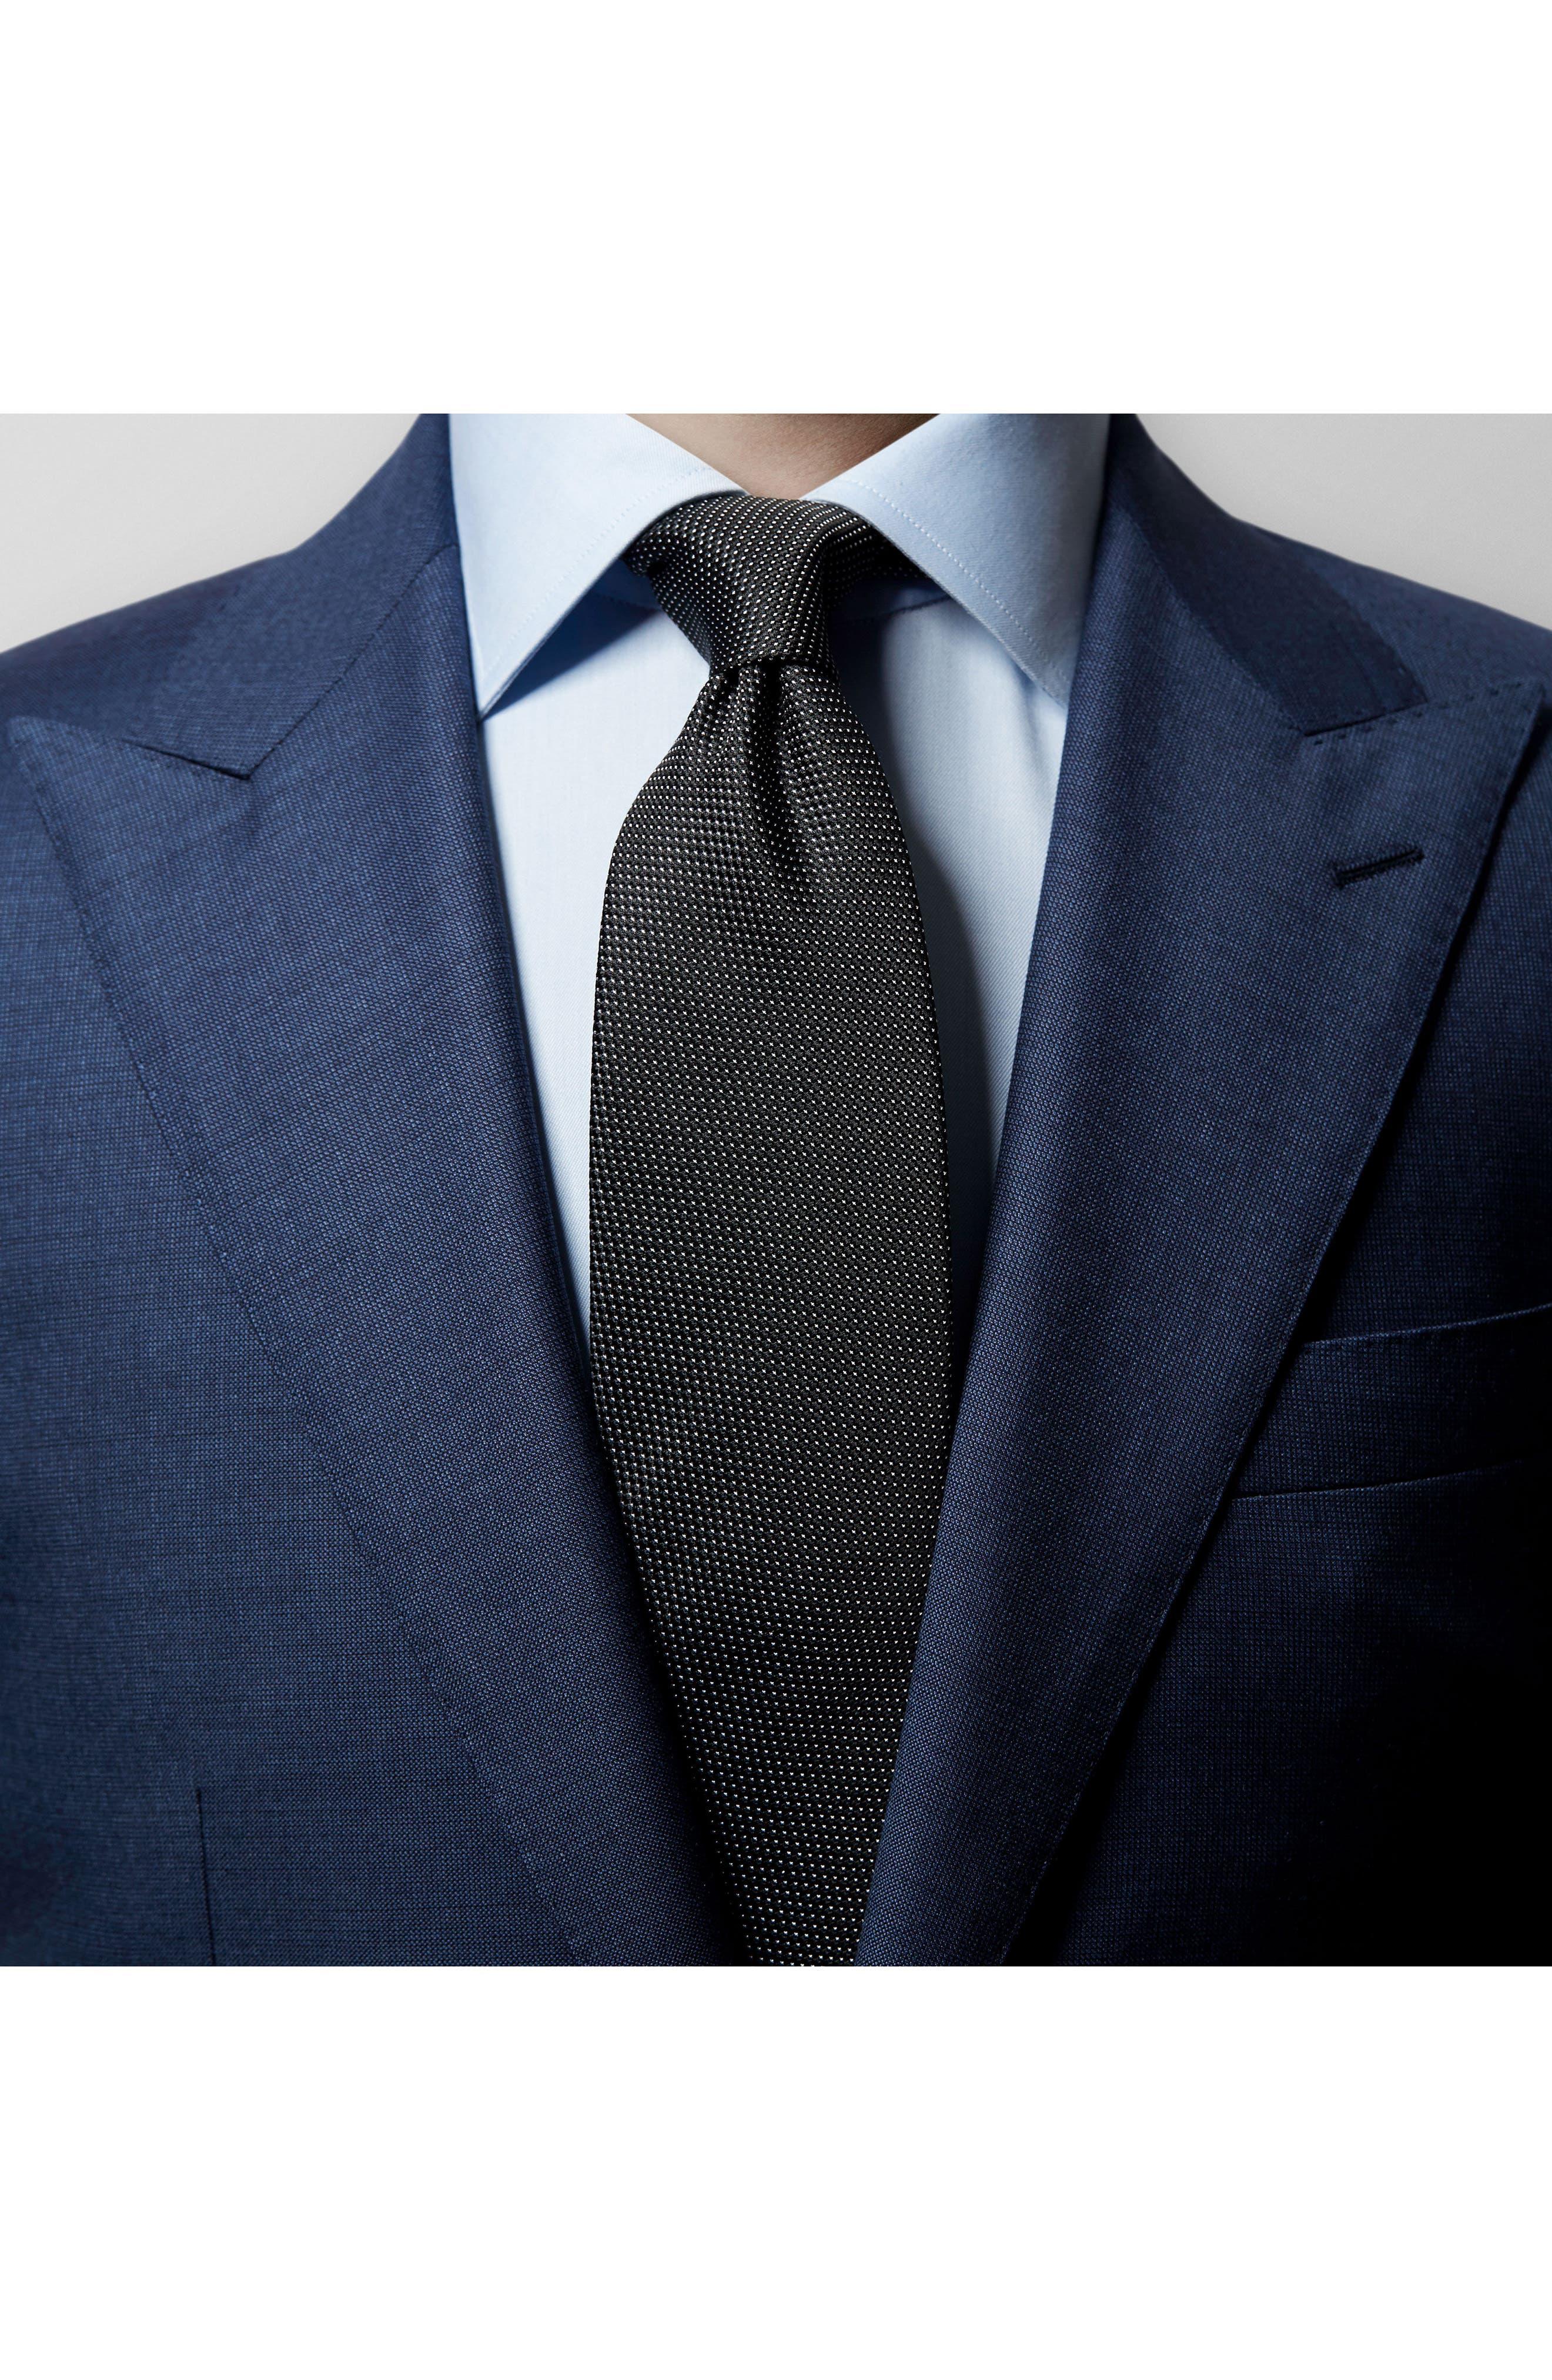 Microdot Silk Tie,                             Alternate thumbnail 5, color,                             BLACK